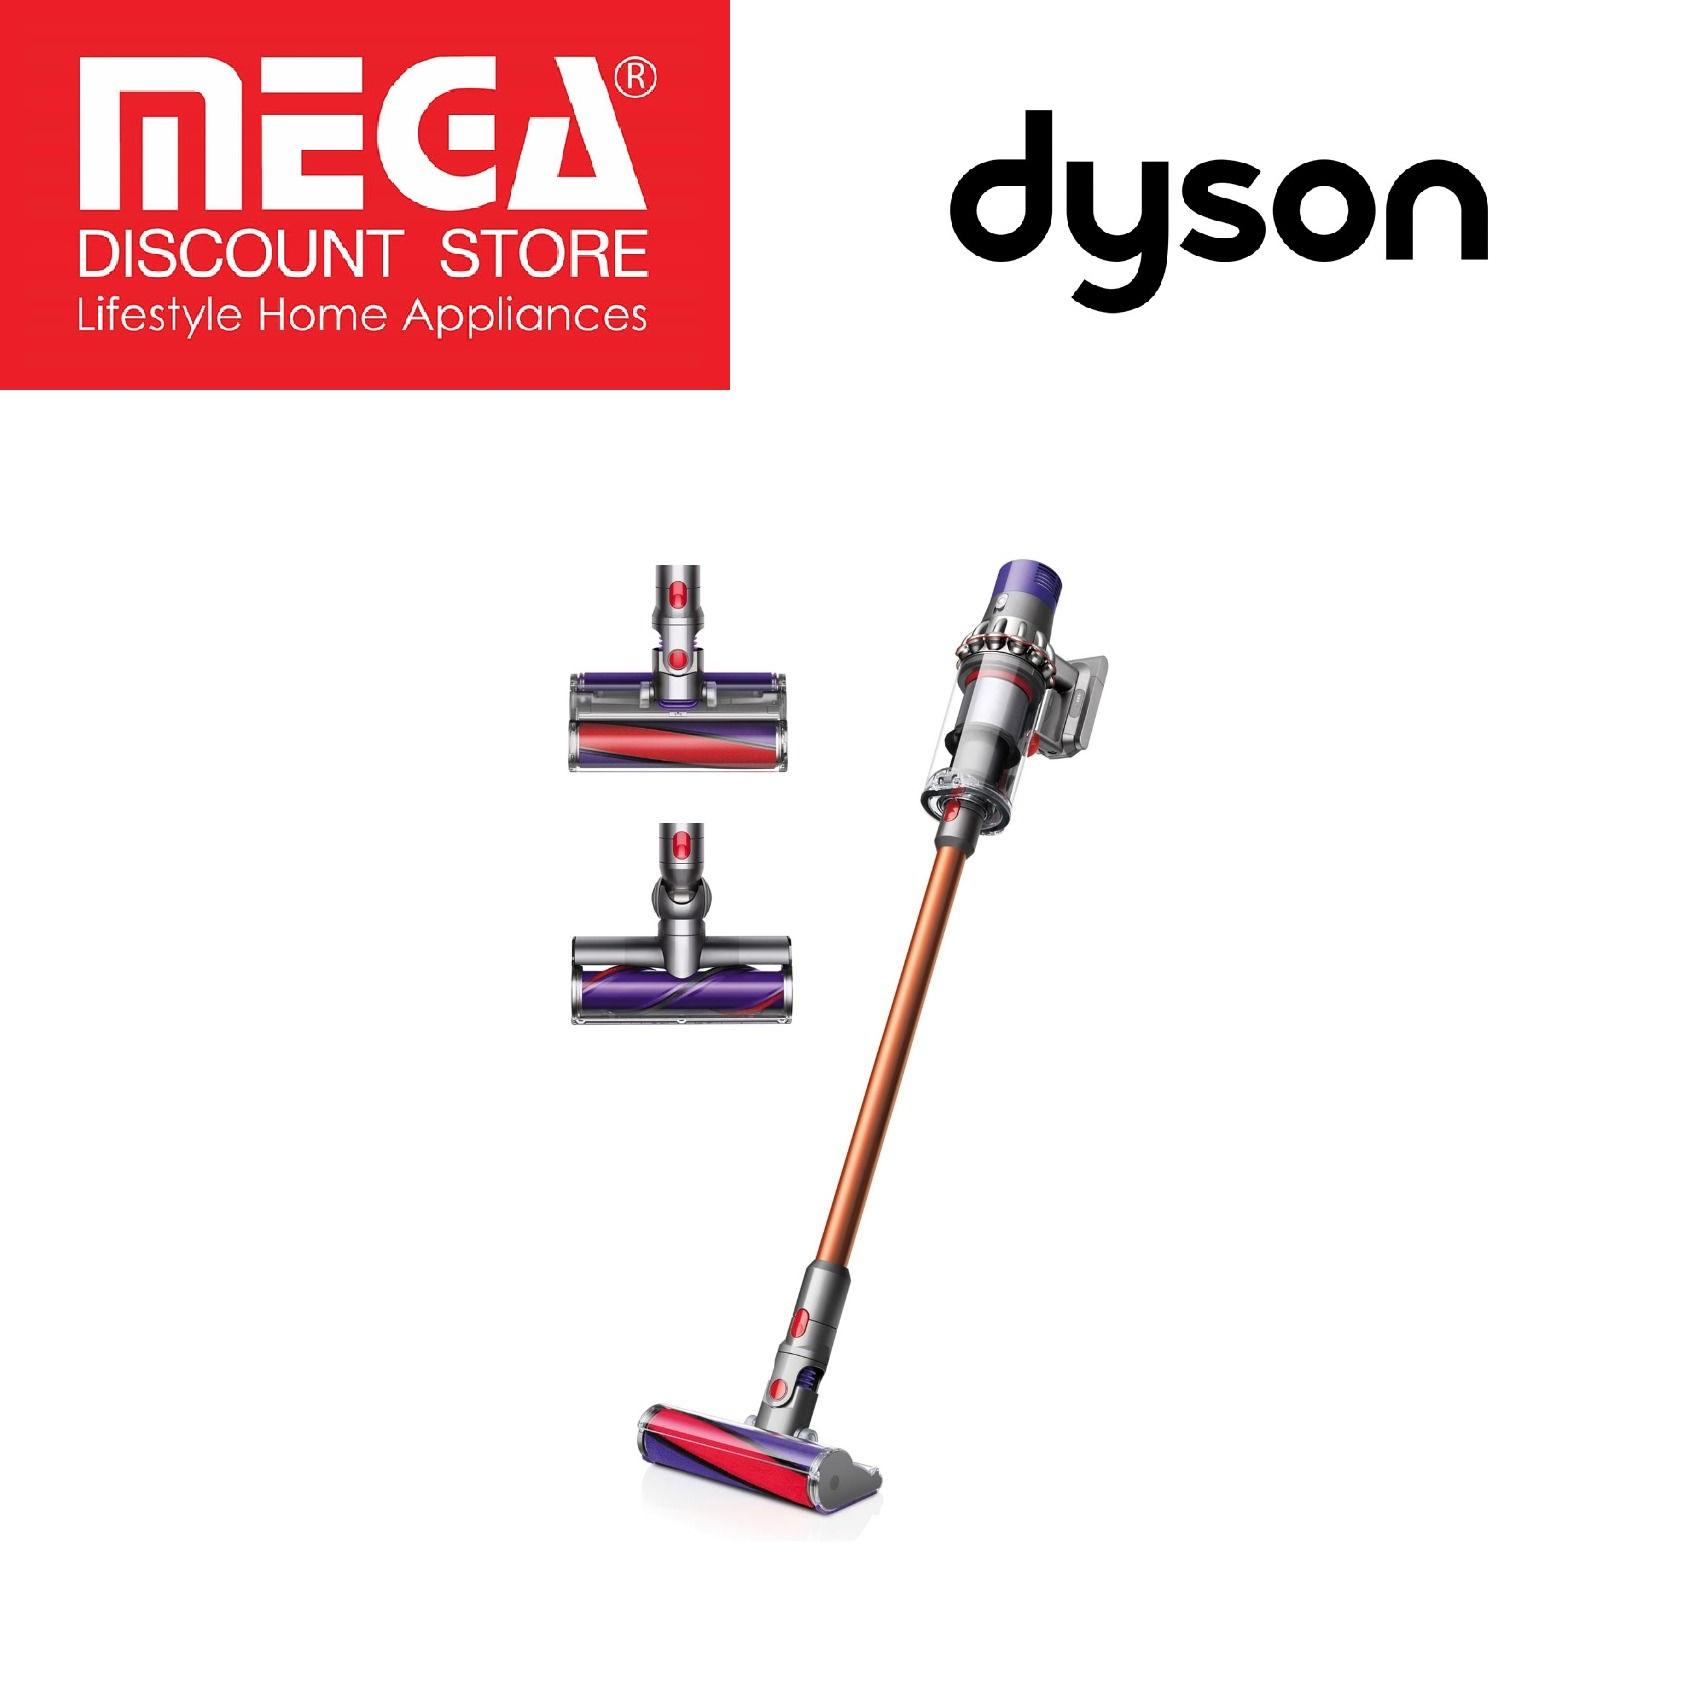 DYSON CYCLONE V10 ABSOLUTE PLUS VACUUM